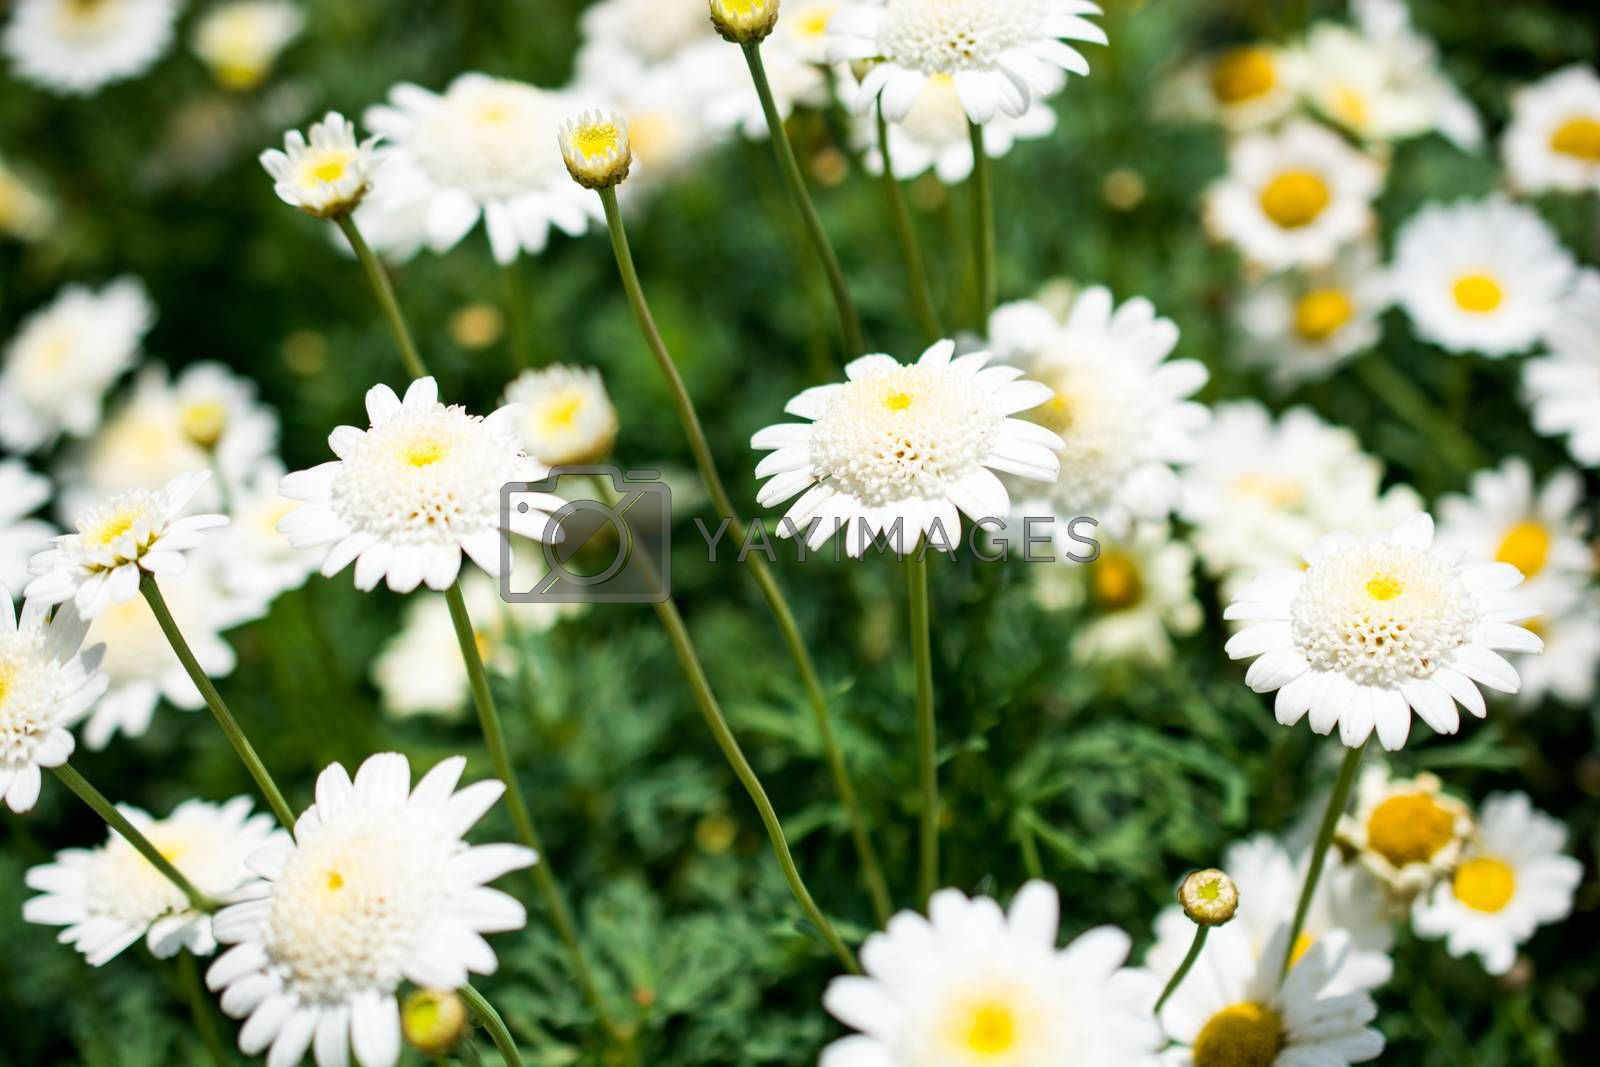 Beautiful flowers in nature by berkay